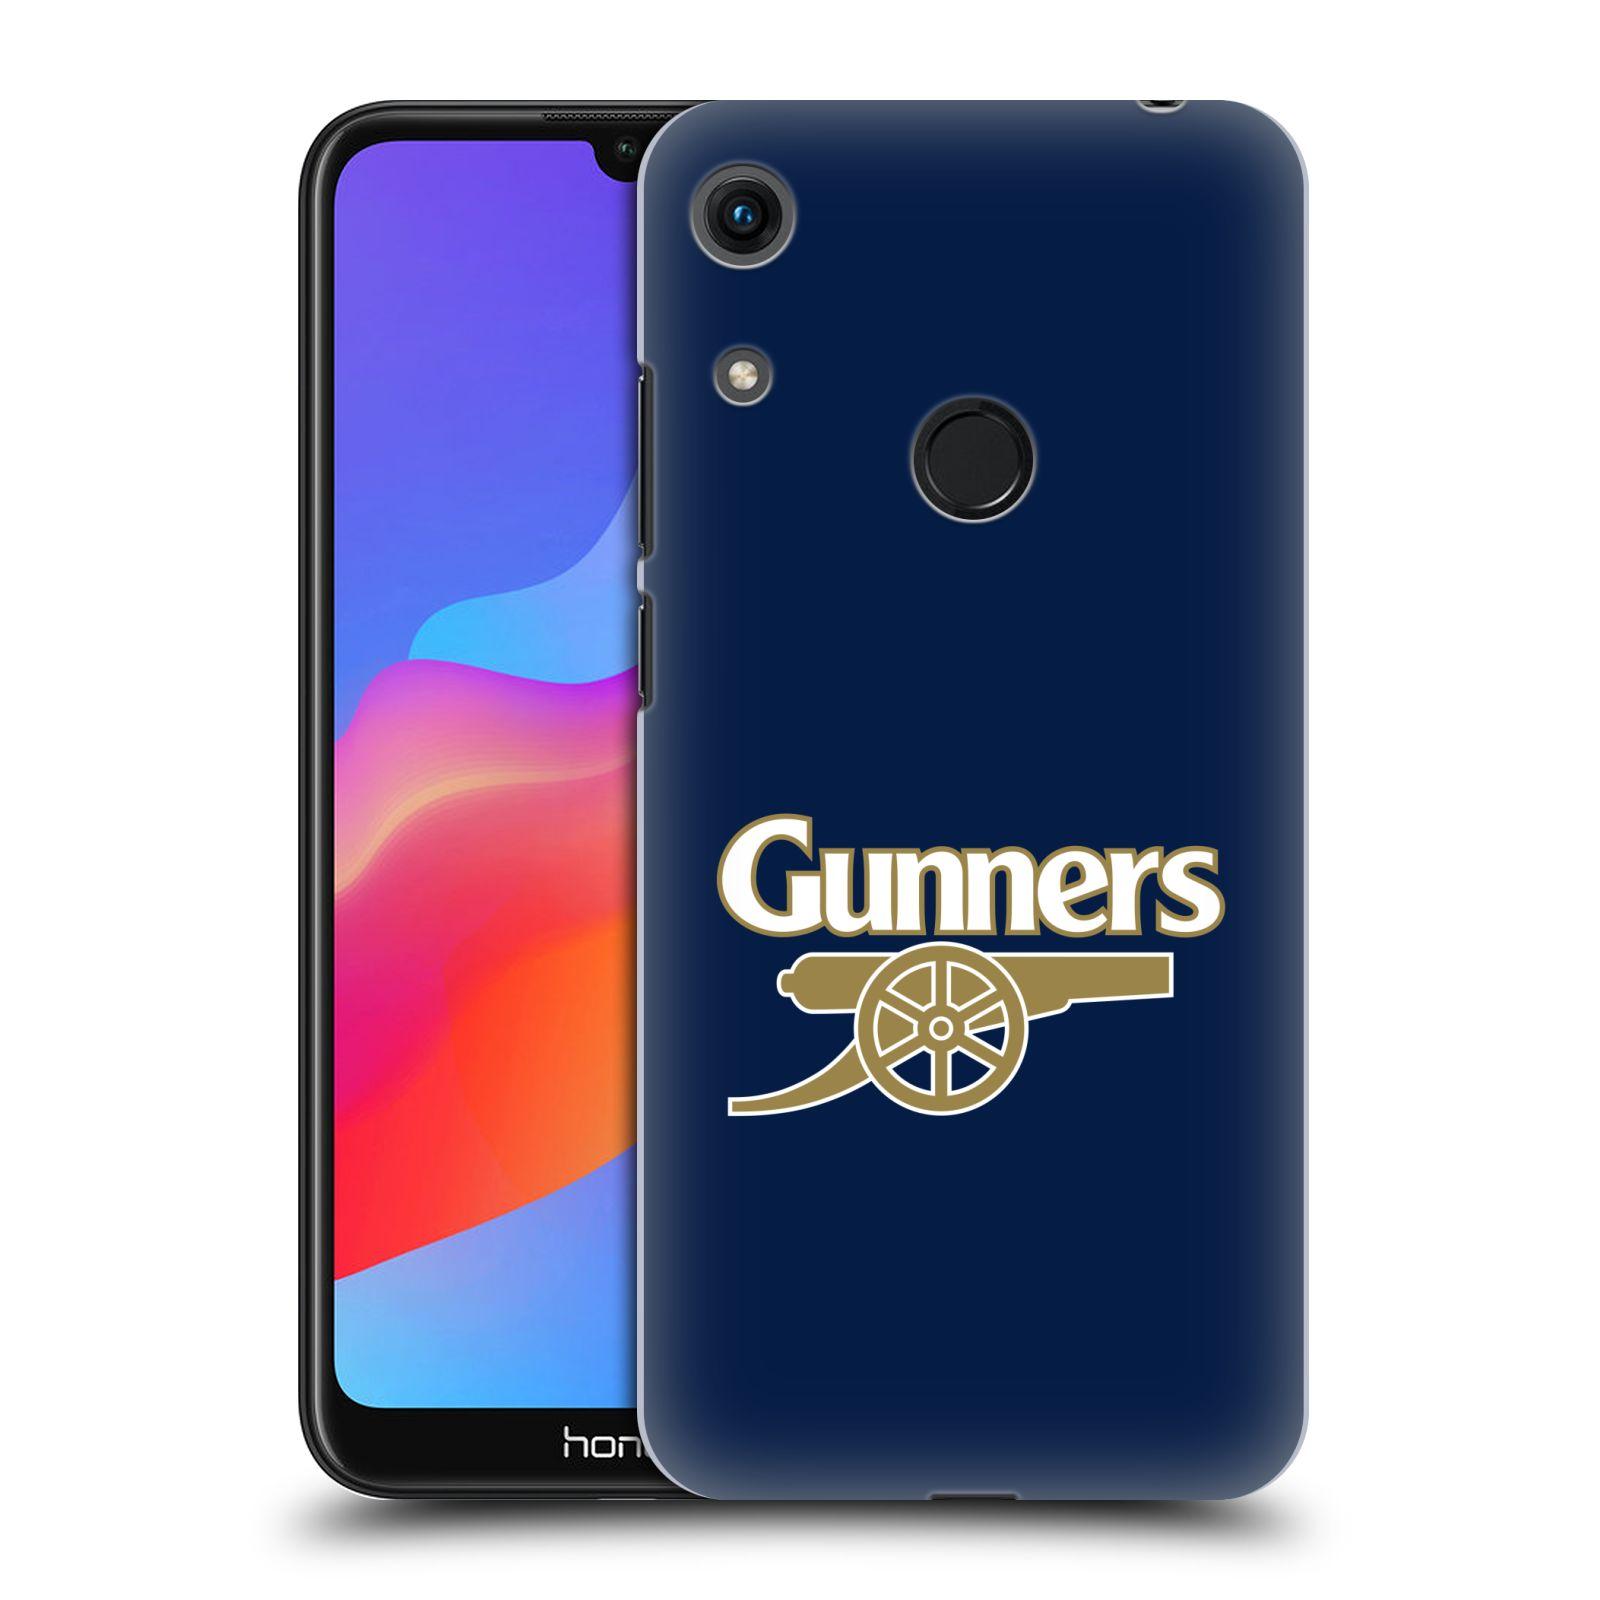 Plastové pouzdro na mobil Honor 8A - Head Case - Arsenal FC - Gunners